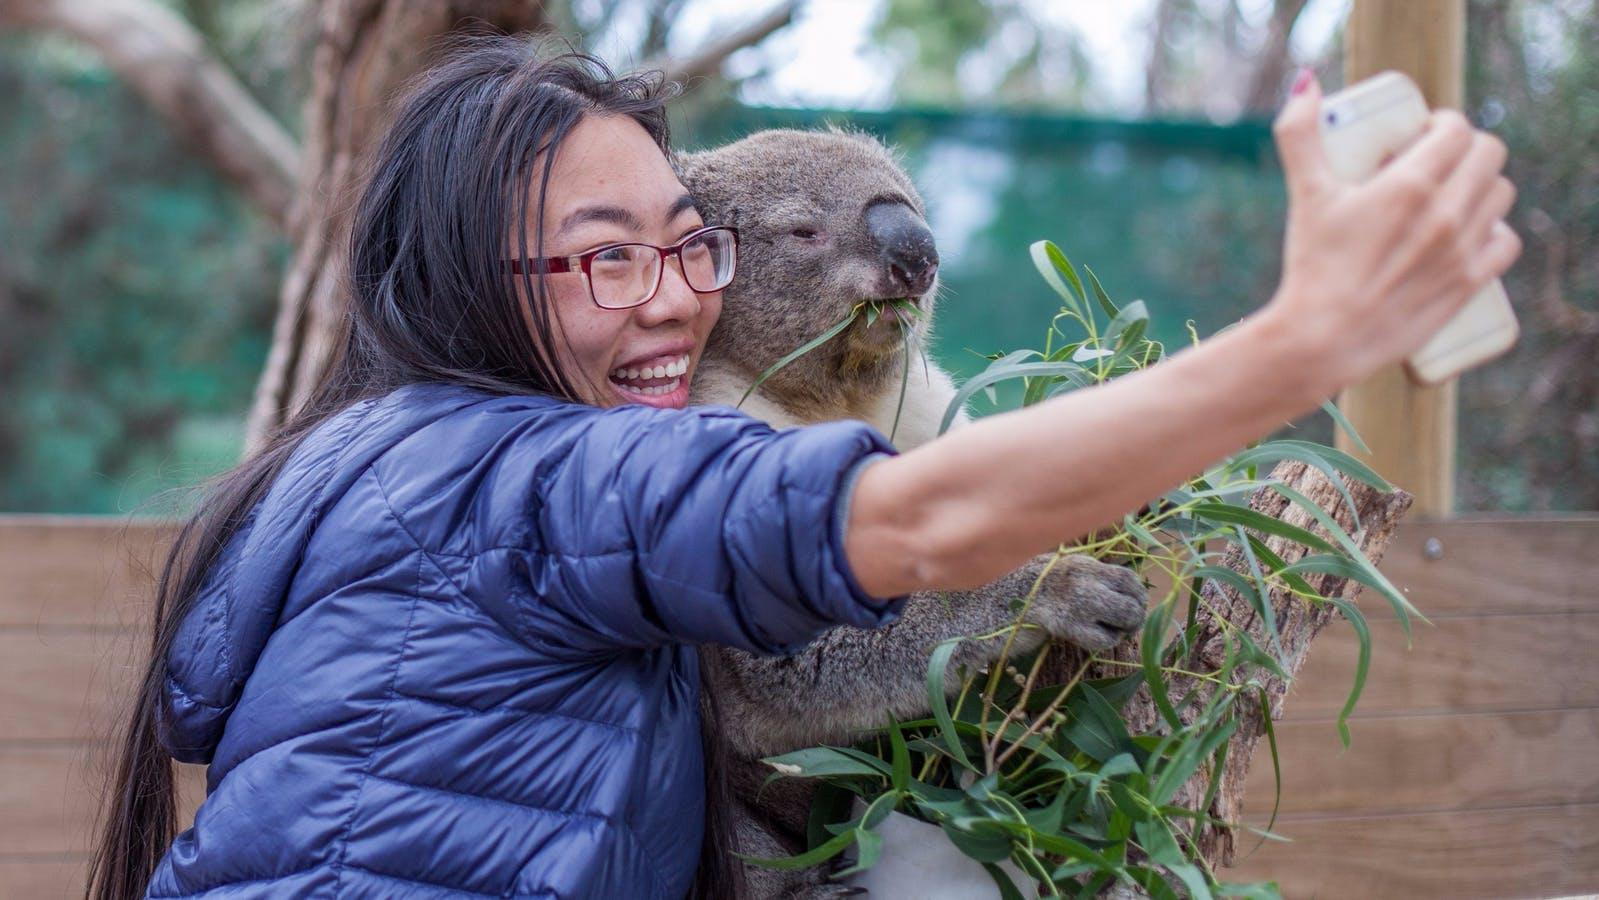 Cuddling a koala during the koala encounter at Moonlit Sanctuary